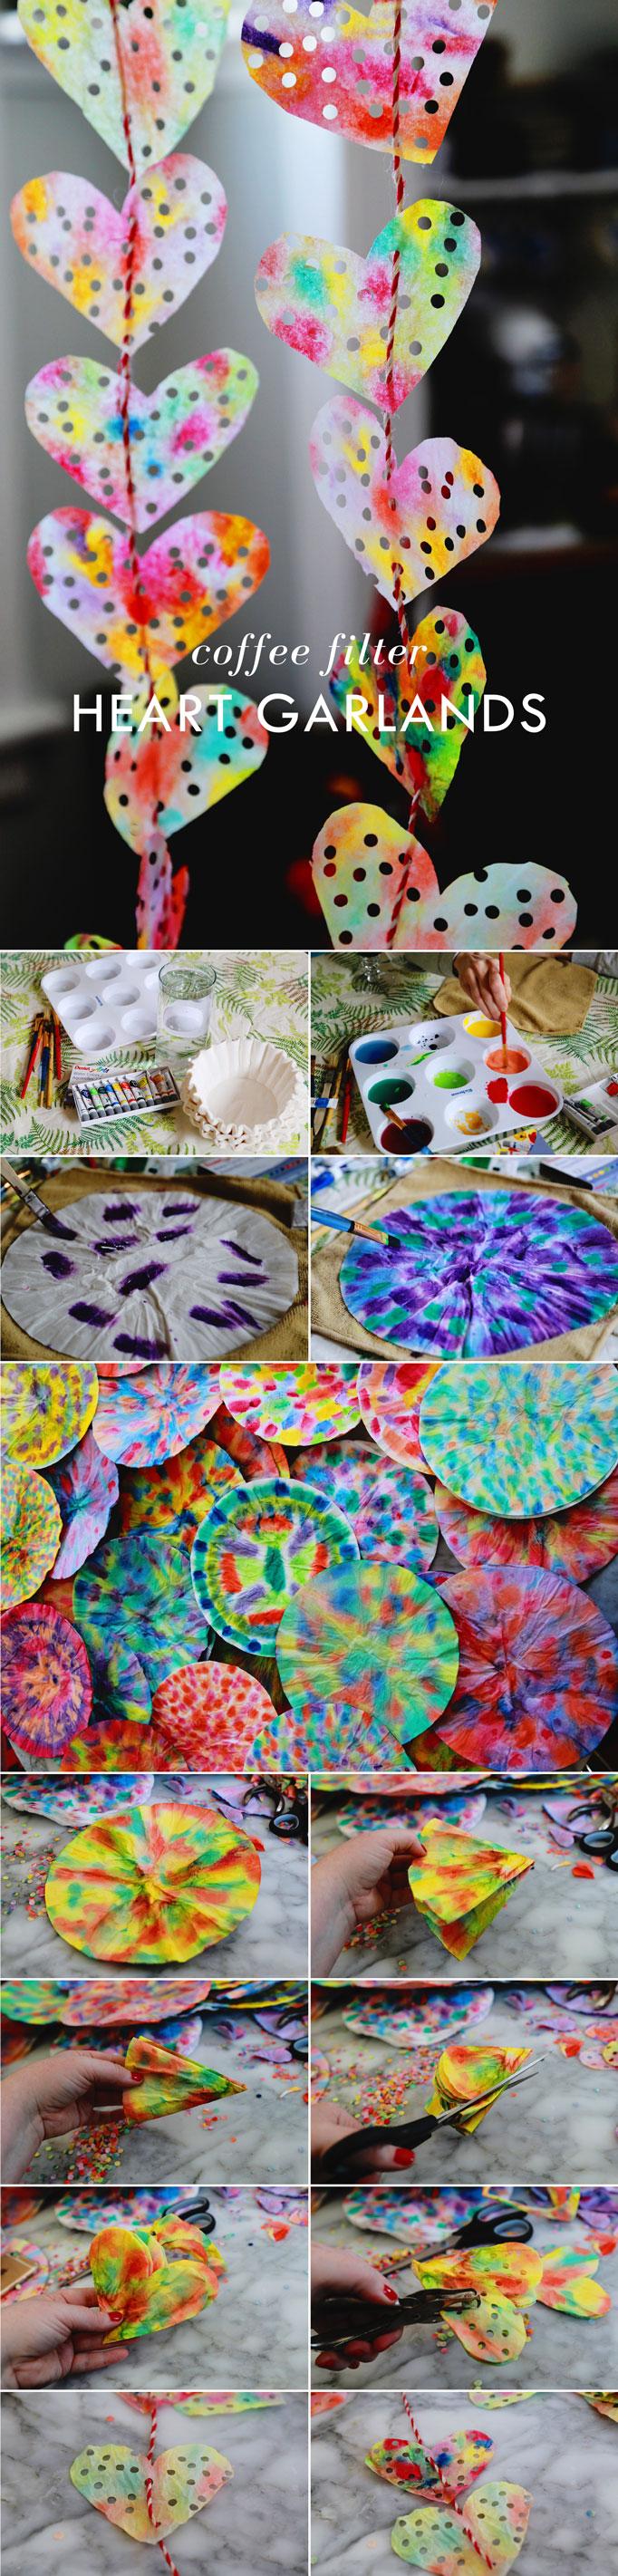 valentine-craft-garland-heart-coffee-filter-painting-682